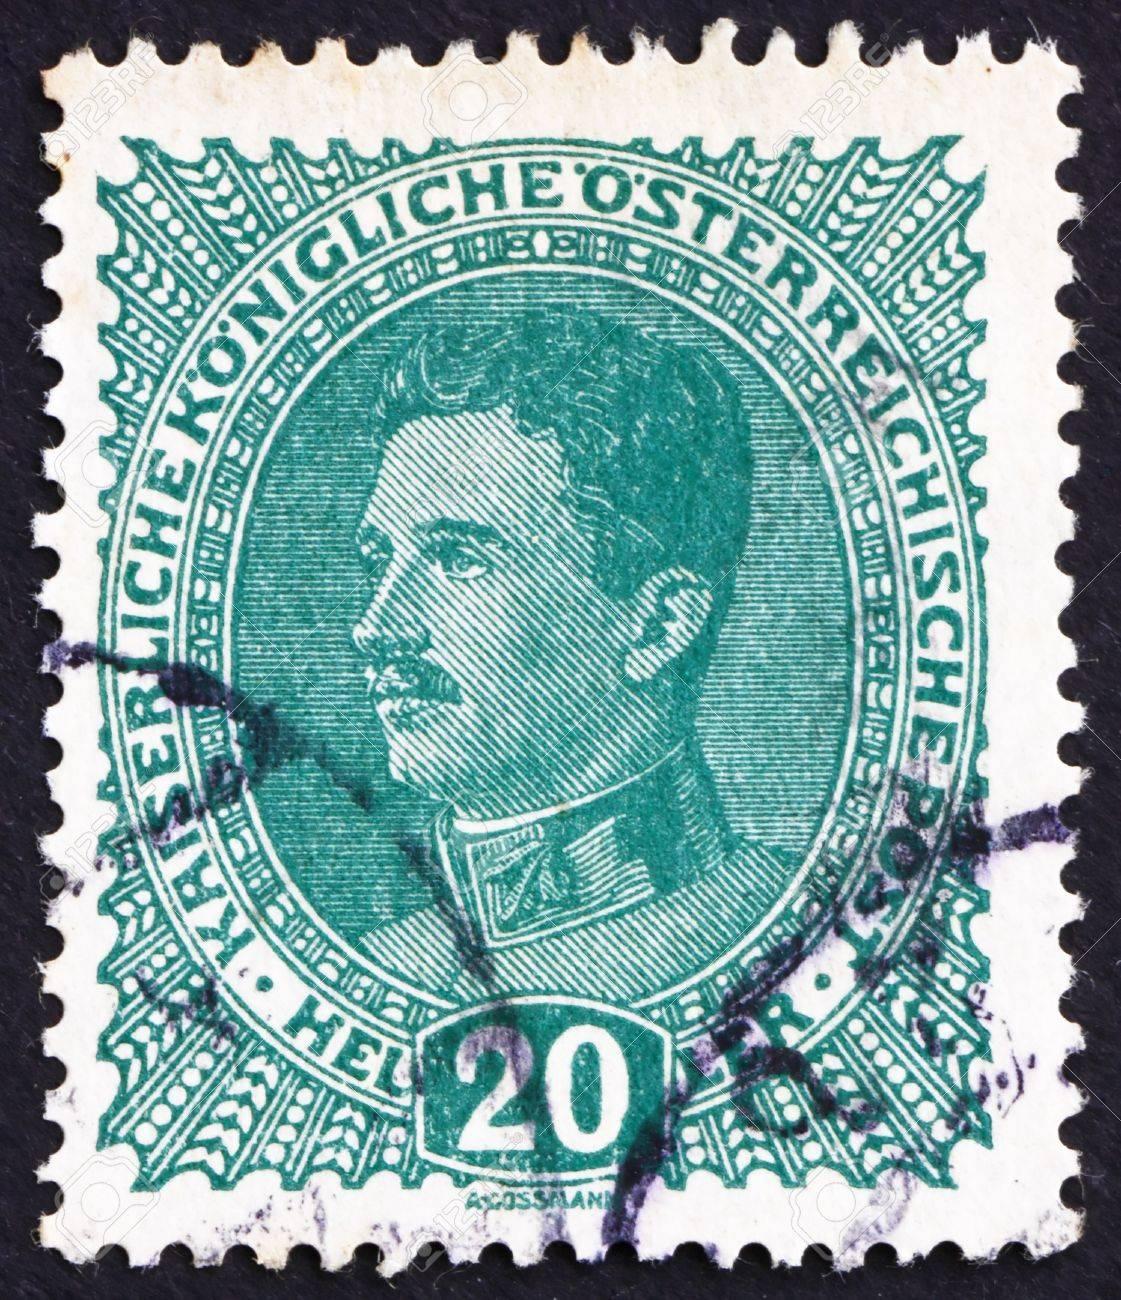 AUSTRIA - CIRCA 1918: a stamp printed in the Austria shows Karl I, Emperor of Austria, circa 1918 Stock Photo - 16224808